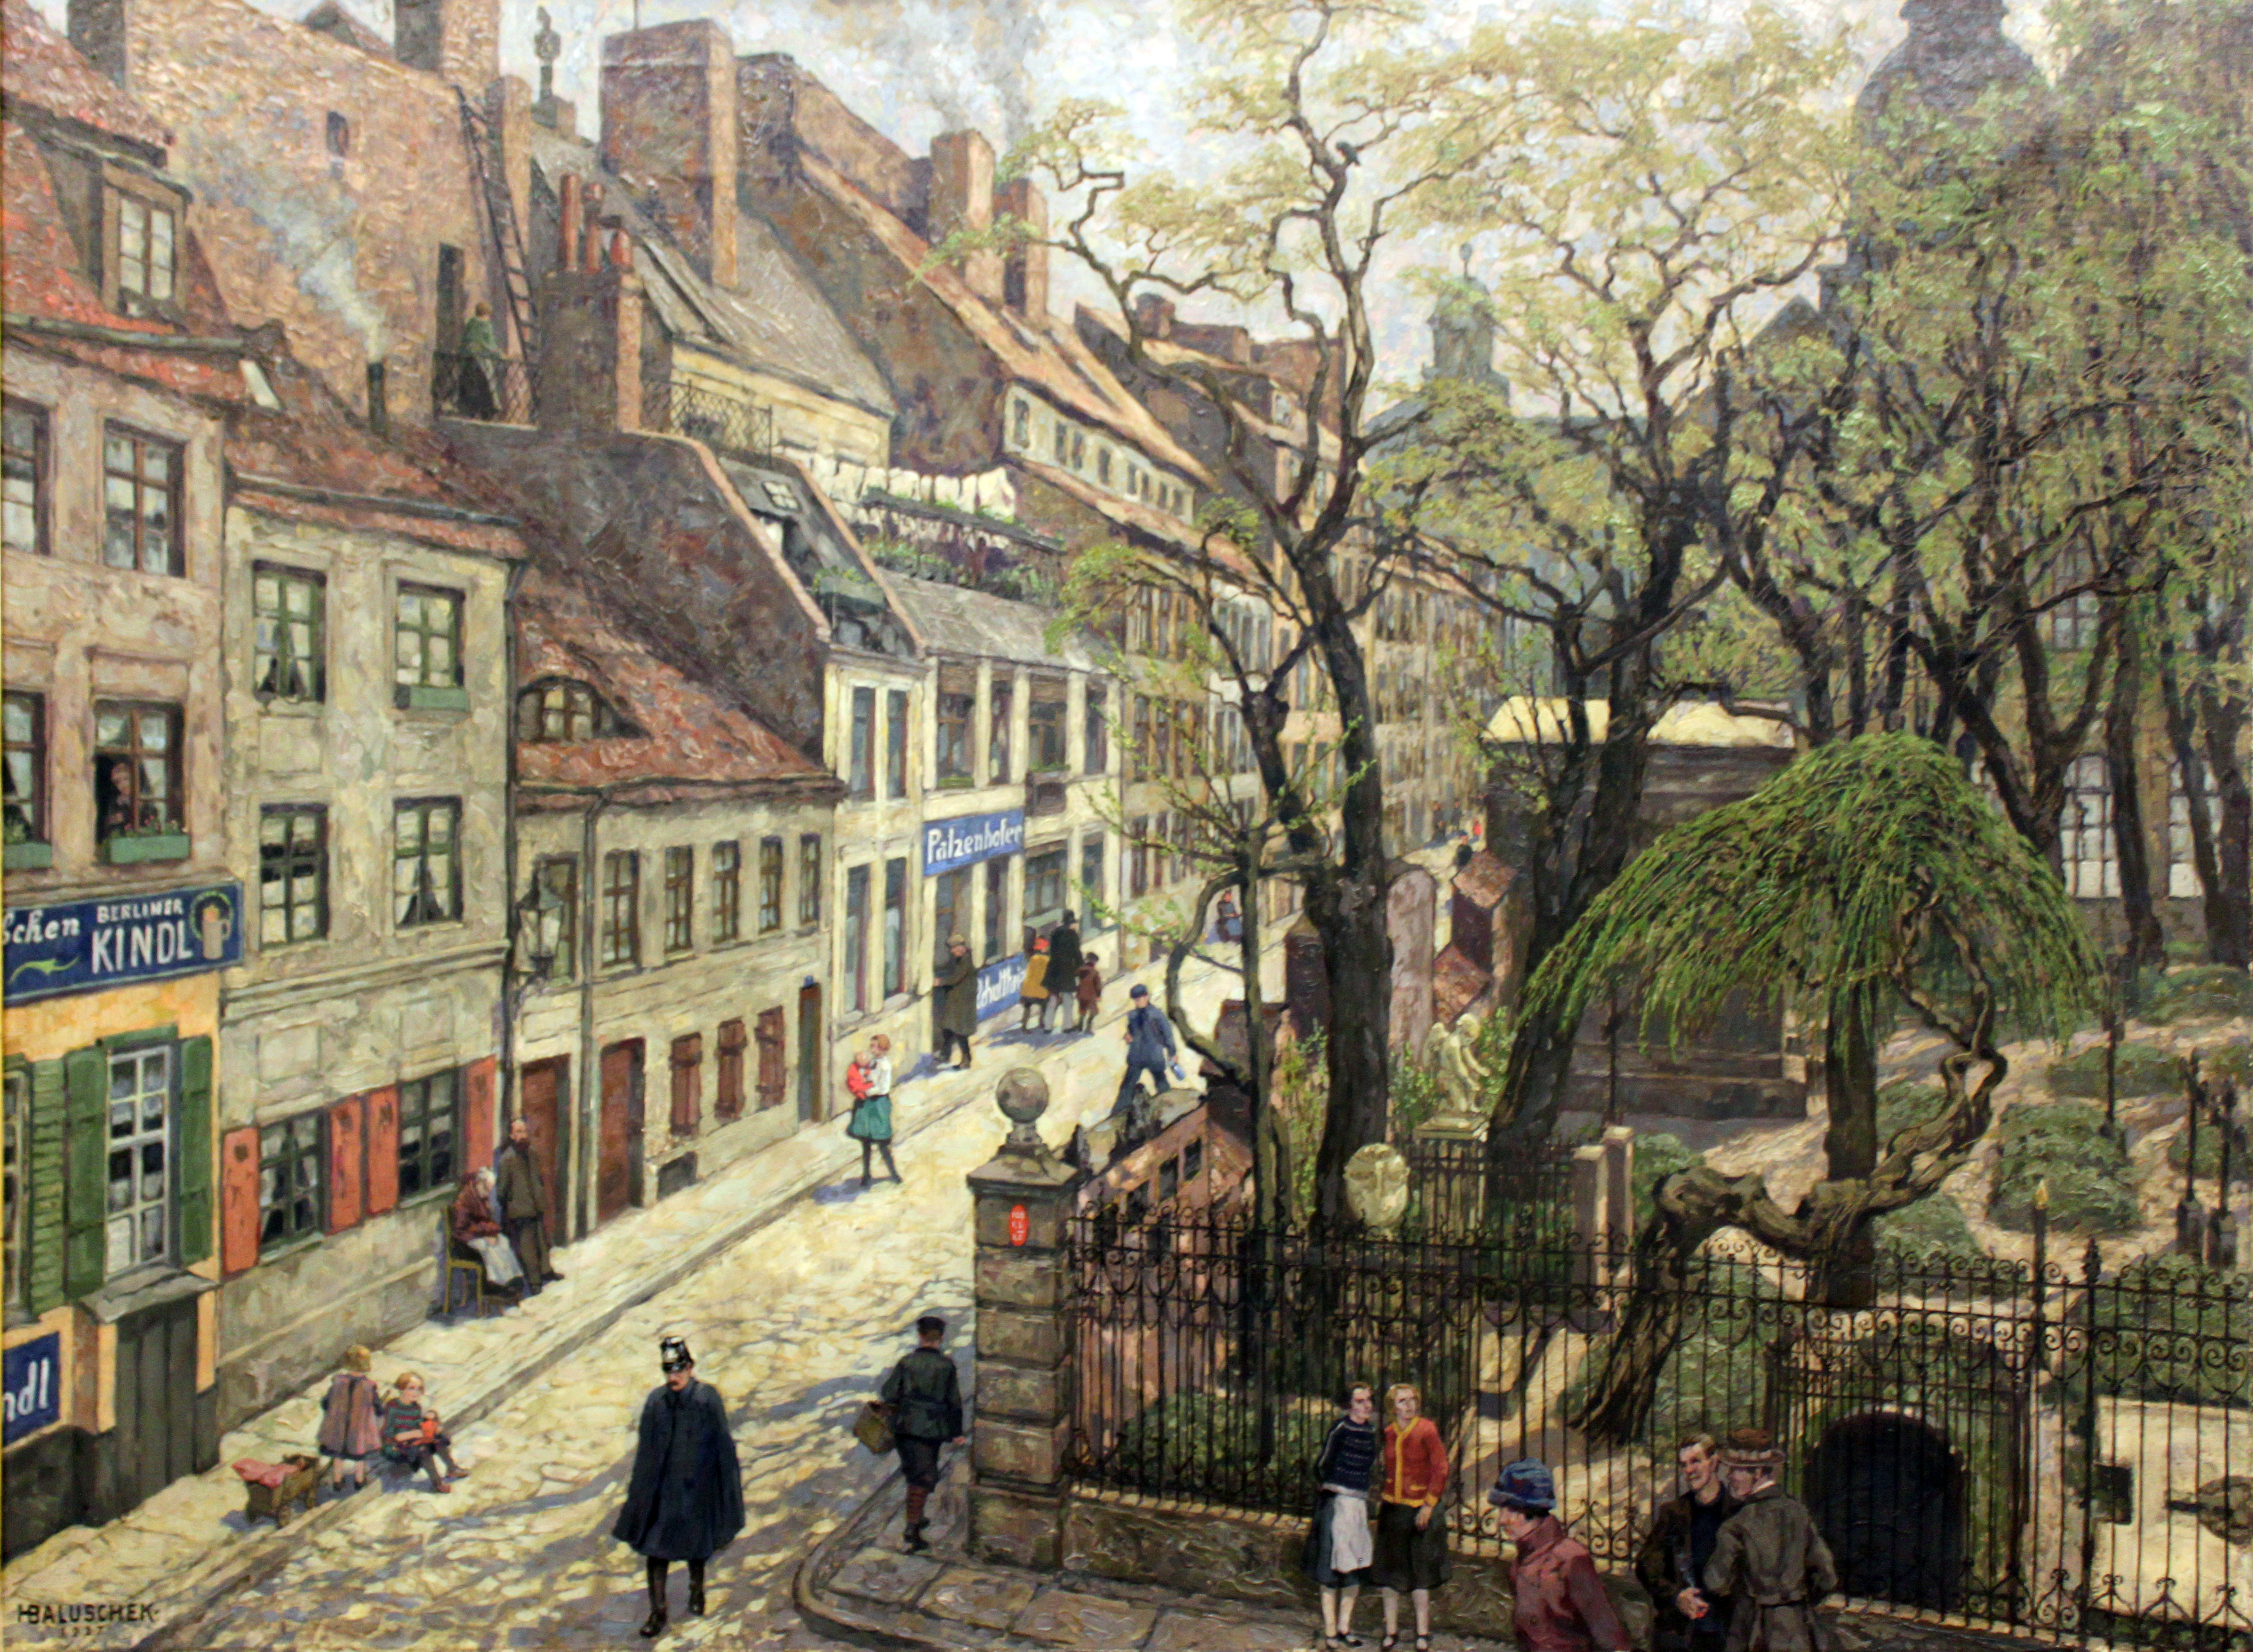 https://upload.wikimedia.org/wikipedia/commons/a/ae/1927_Baluschek_Alt-Berlin_Waisenstrasse_anagoria.JPG